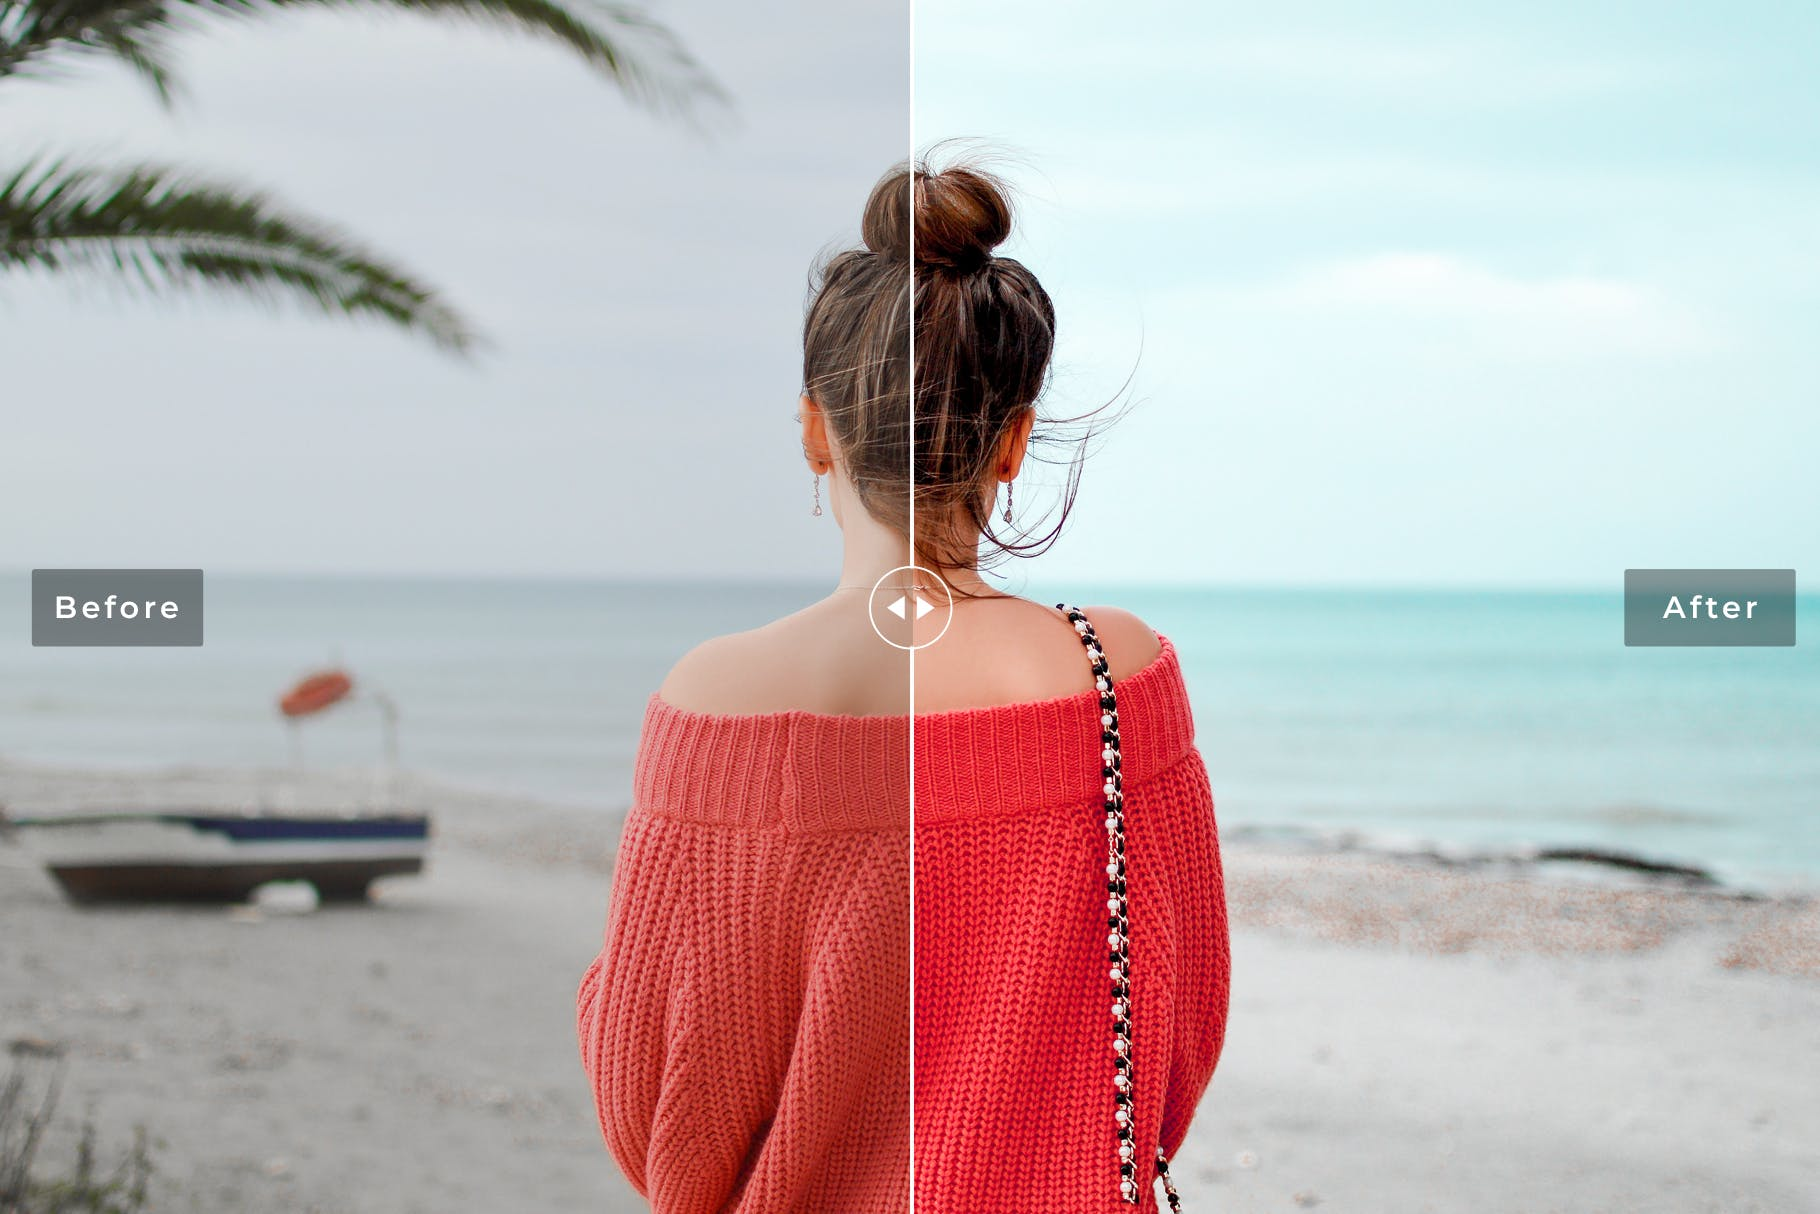 沙滩人物摄影后期调色Lightroom预设 Sea Wind Mobile & Desktop Lightroom Presets设计素材模板